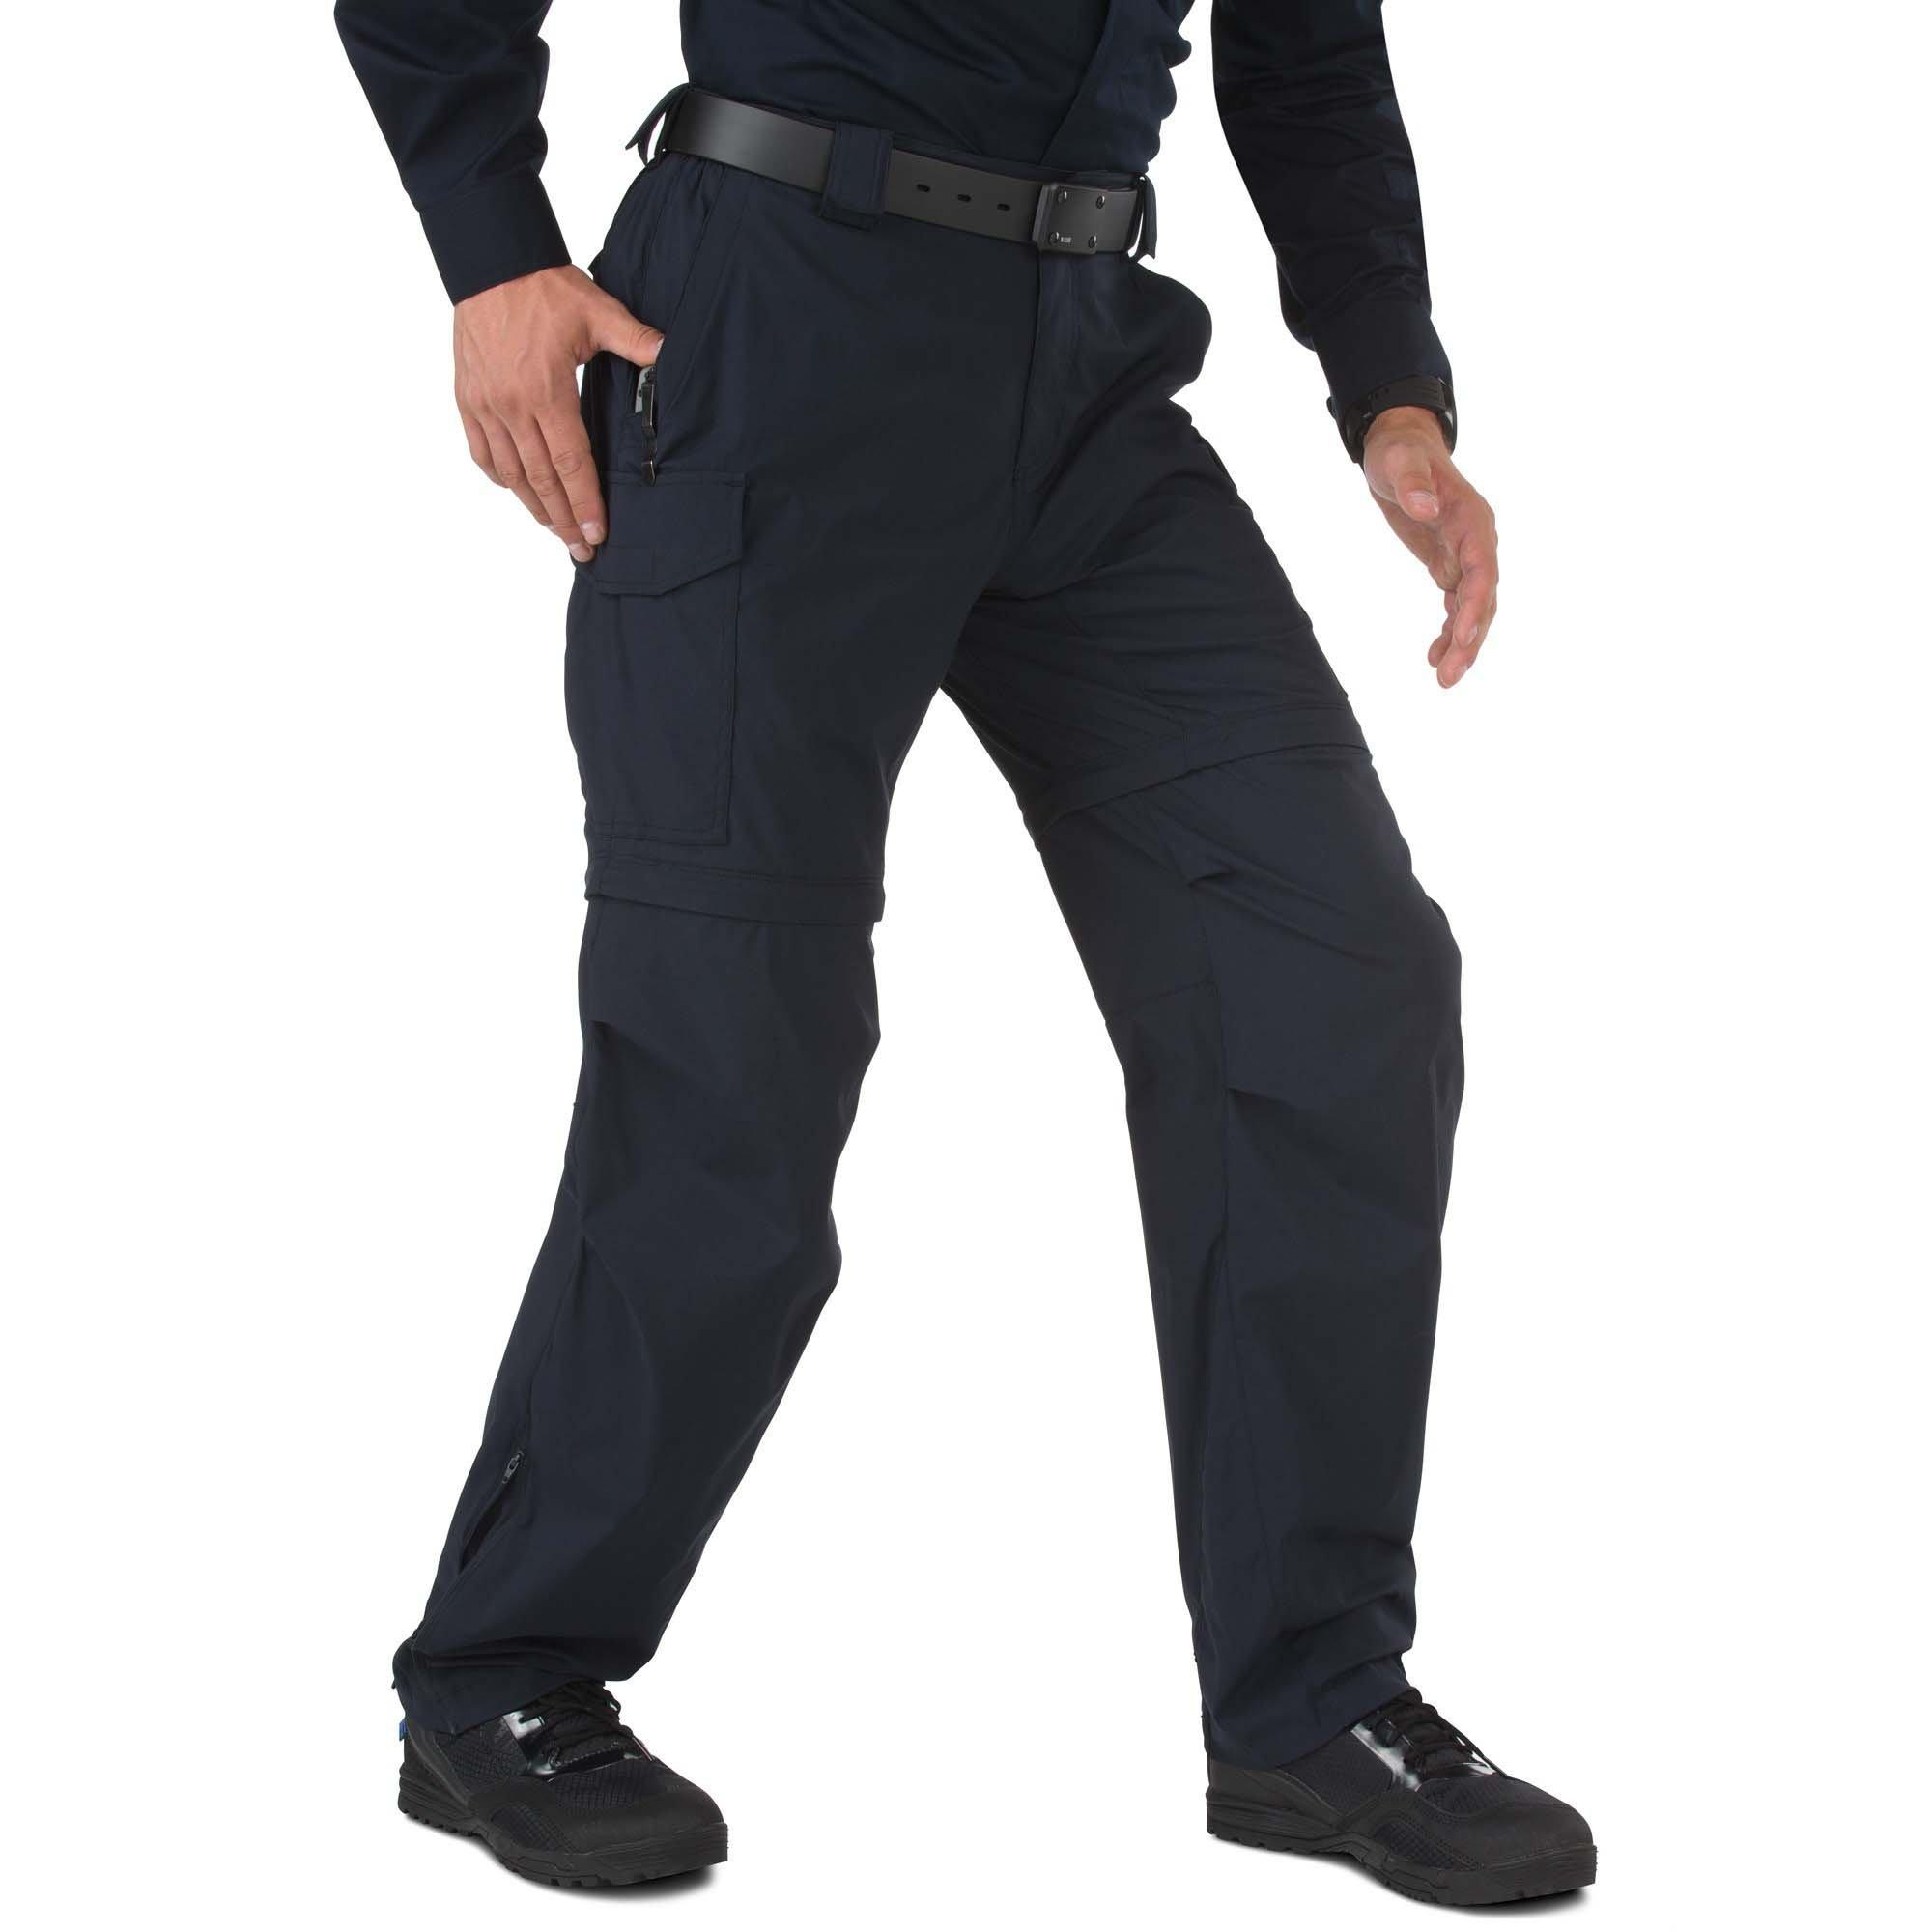 5.11 Men's Bike Patrol Pants, Dark Navy, 34-Waist/32-Length by 5.11